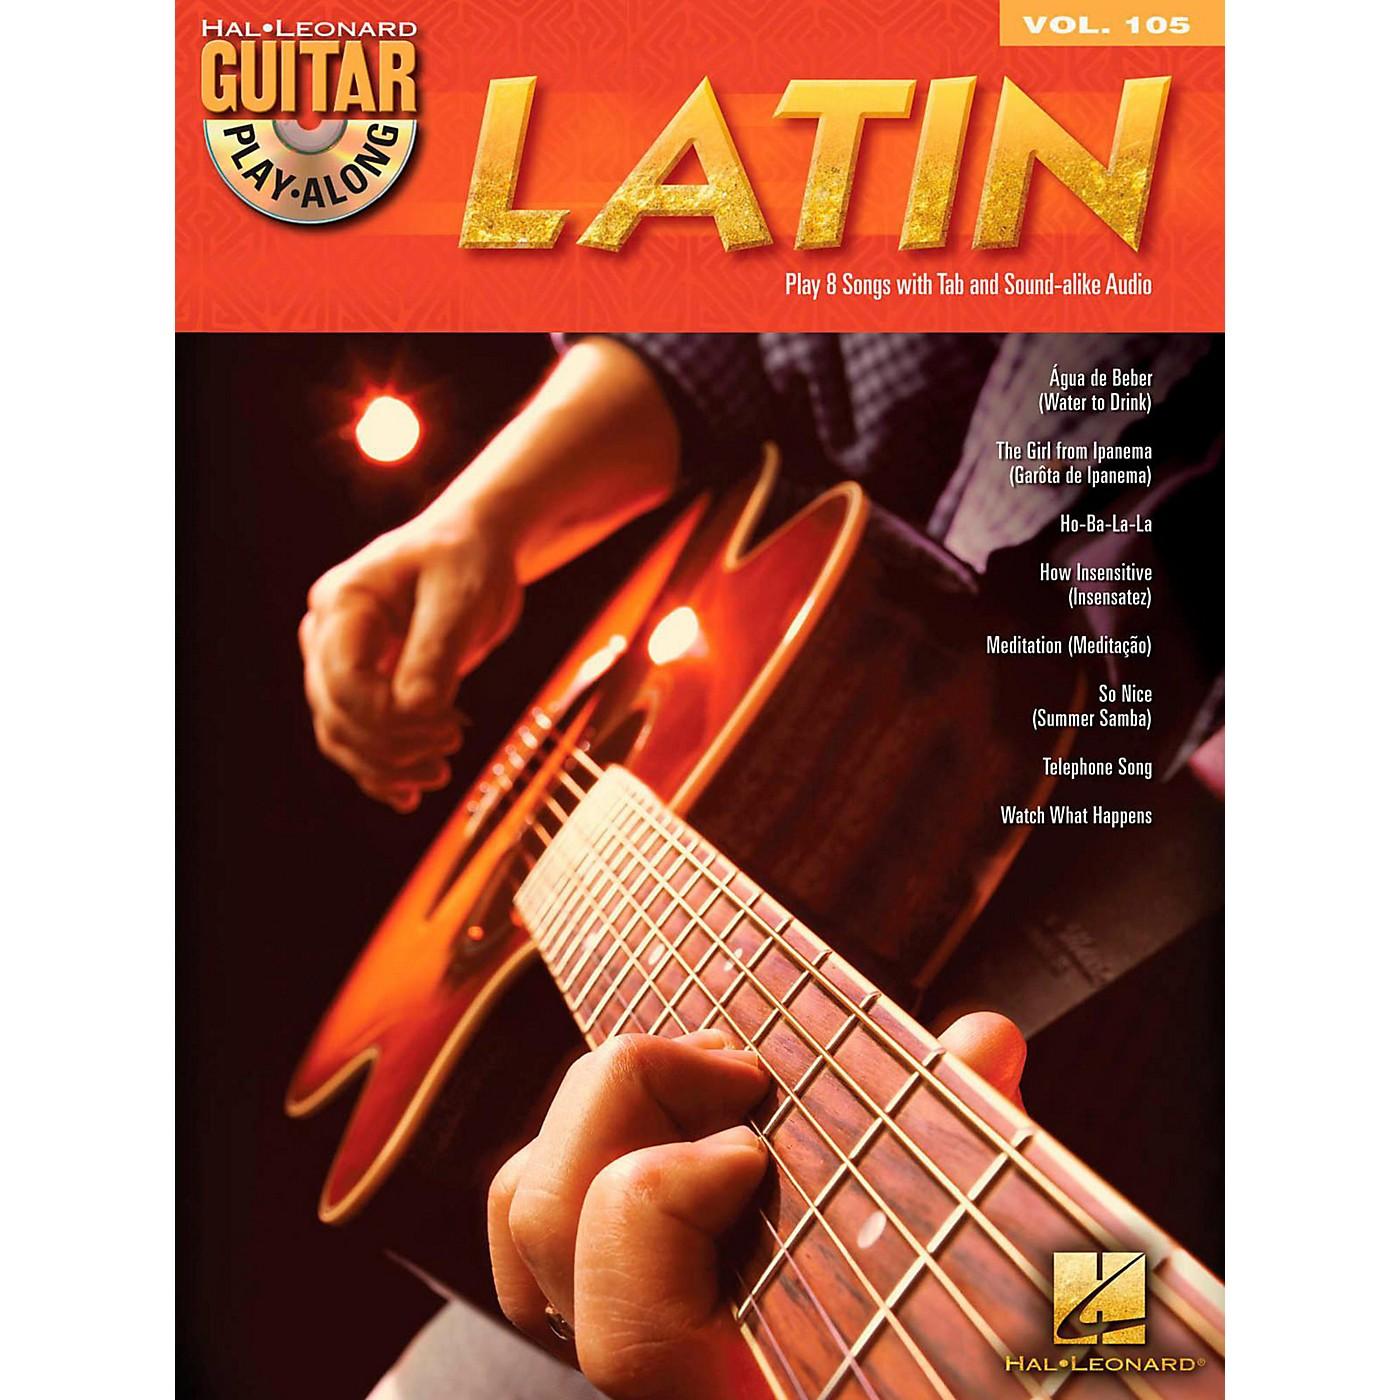 Hal Leonard Latin - Guitar Play-Along Volume 105 Book/CD thumbnail